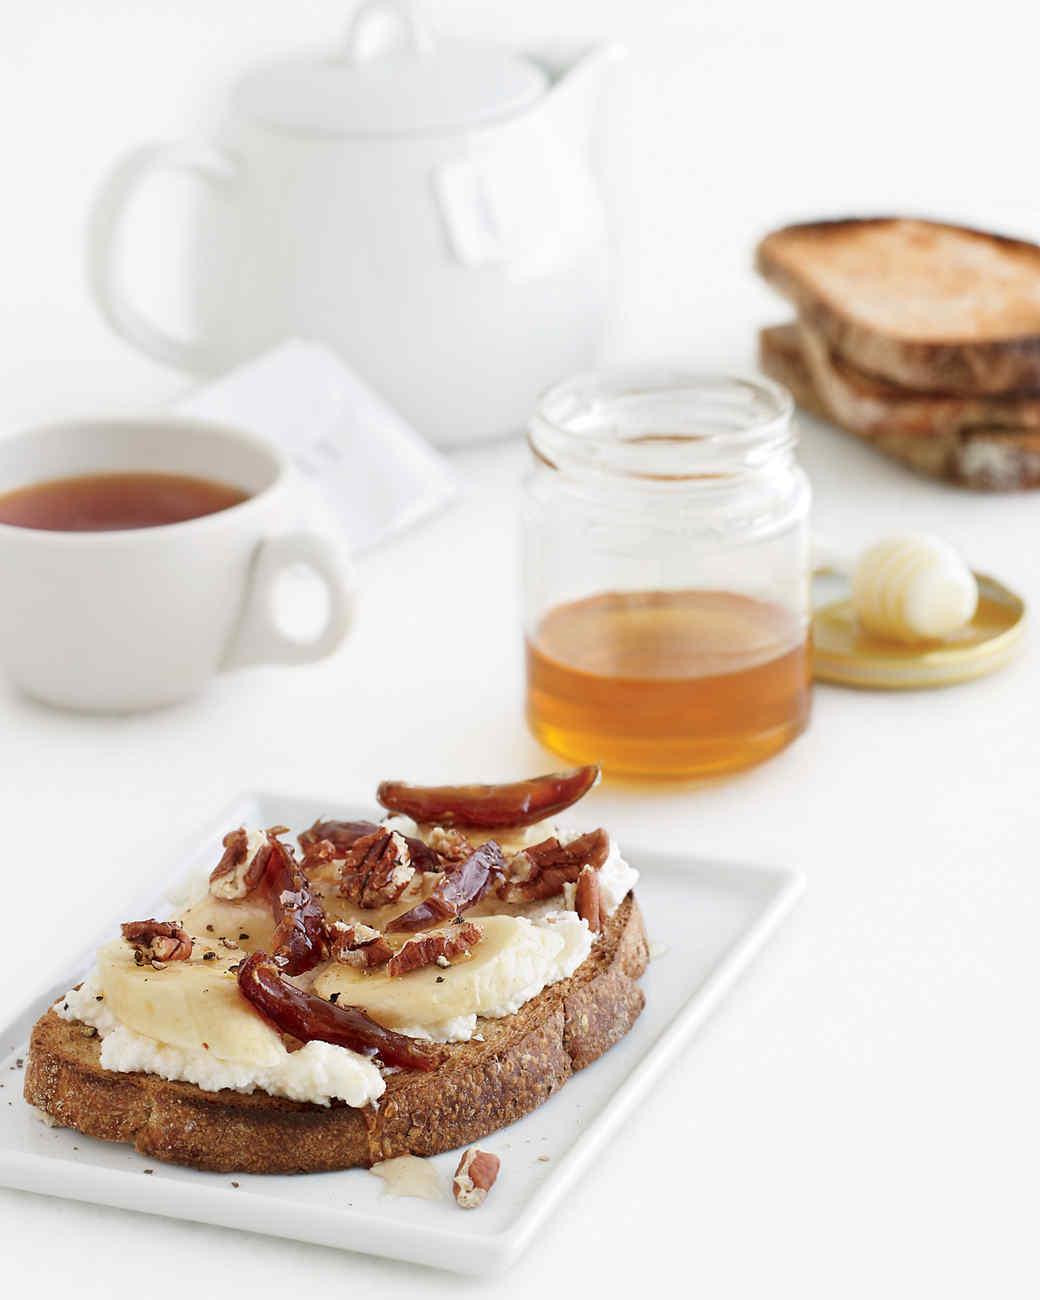 Banana-Ricotta Toasts with Pecans, Dates, and Honey